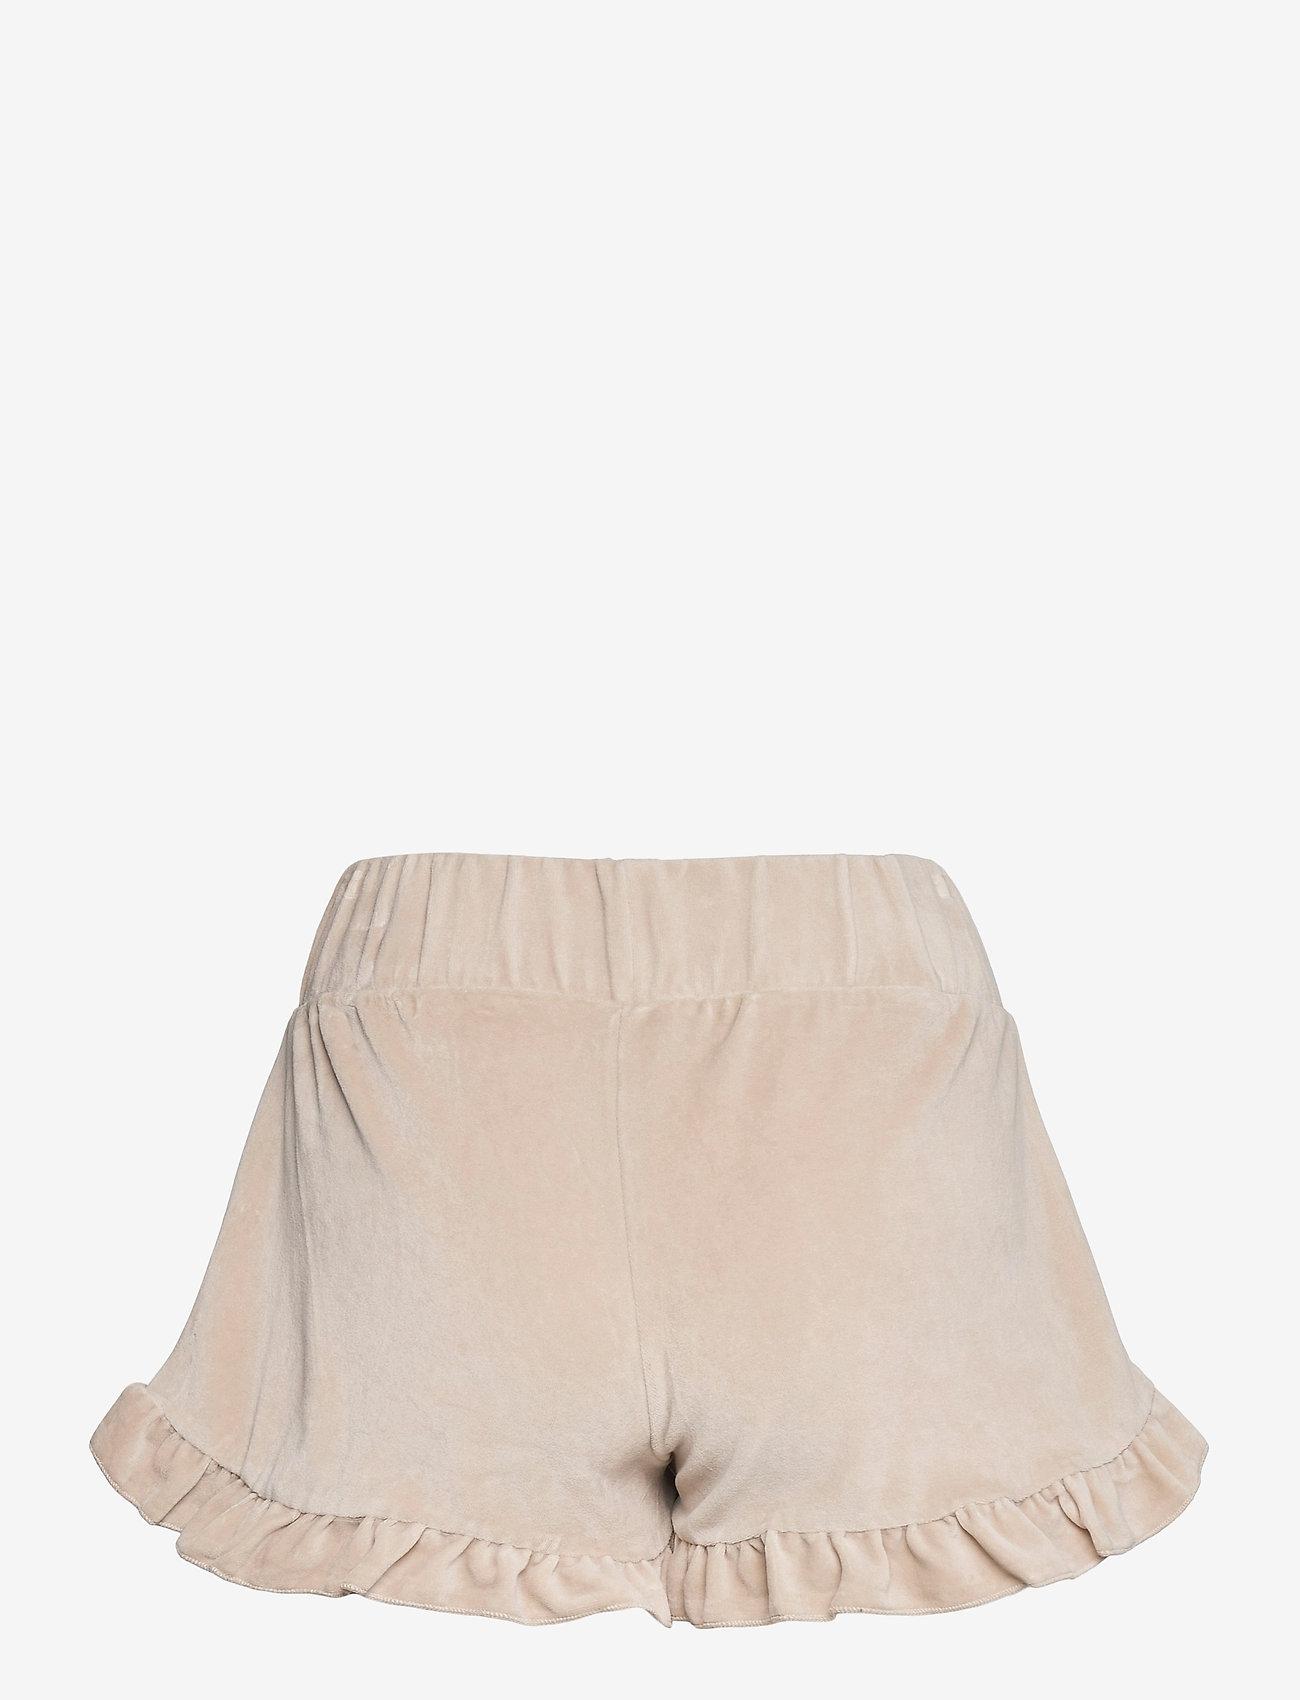 ella&il - Hay velour shorts - shorts casual - beige - 1